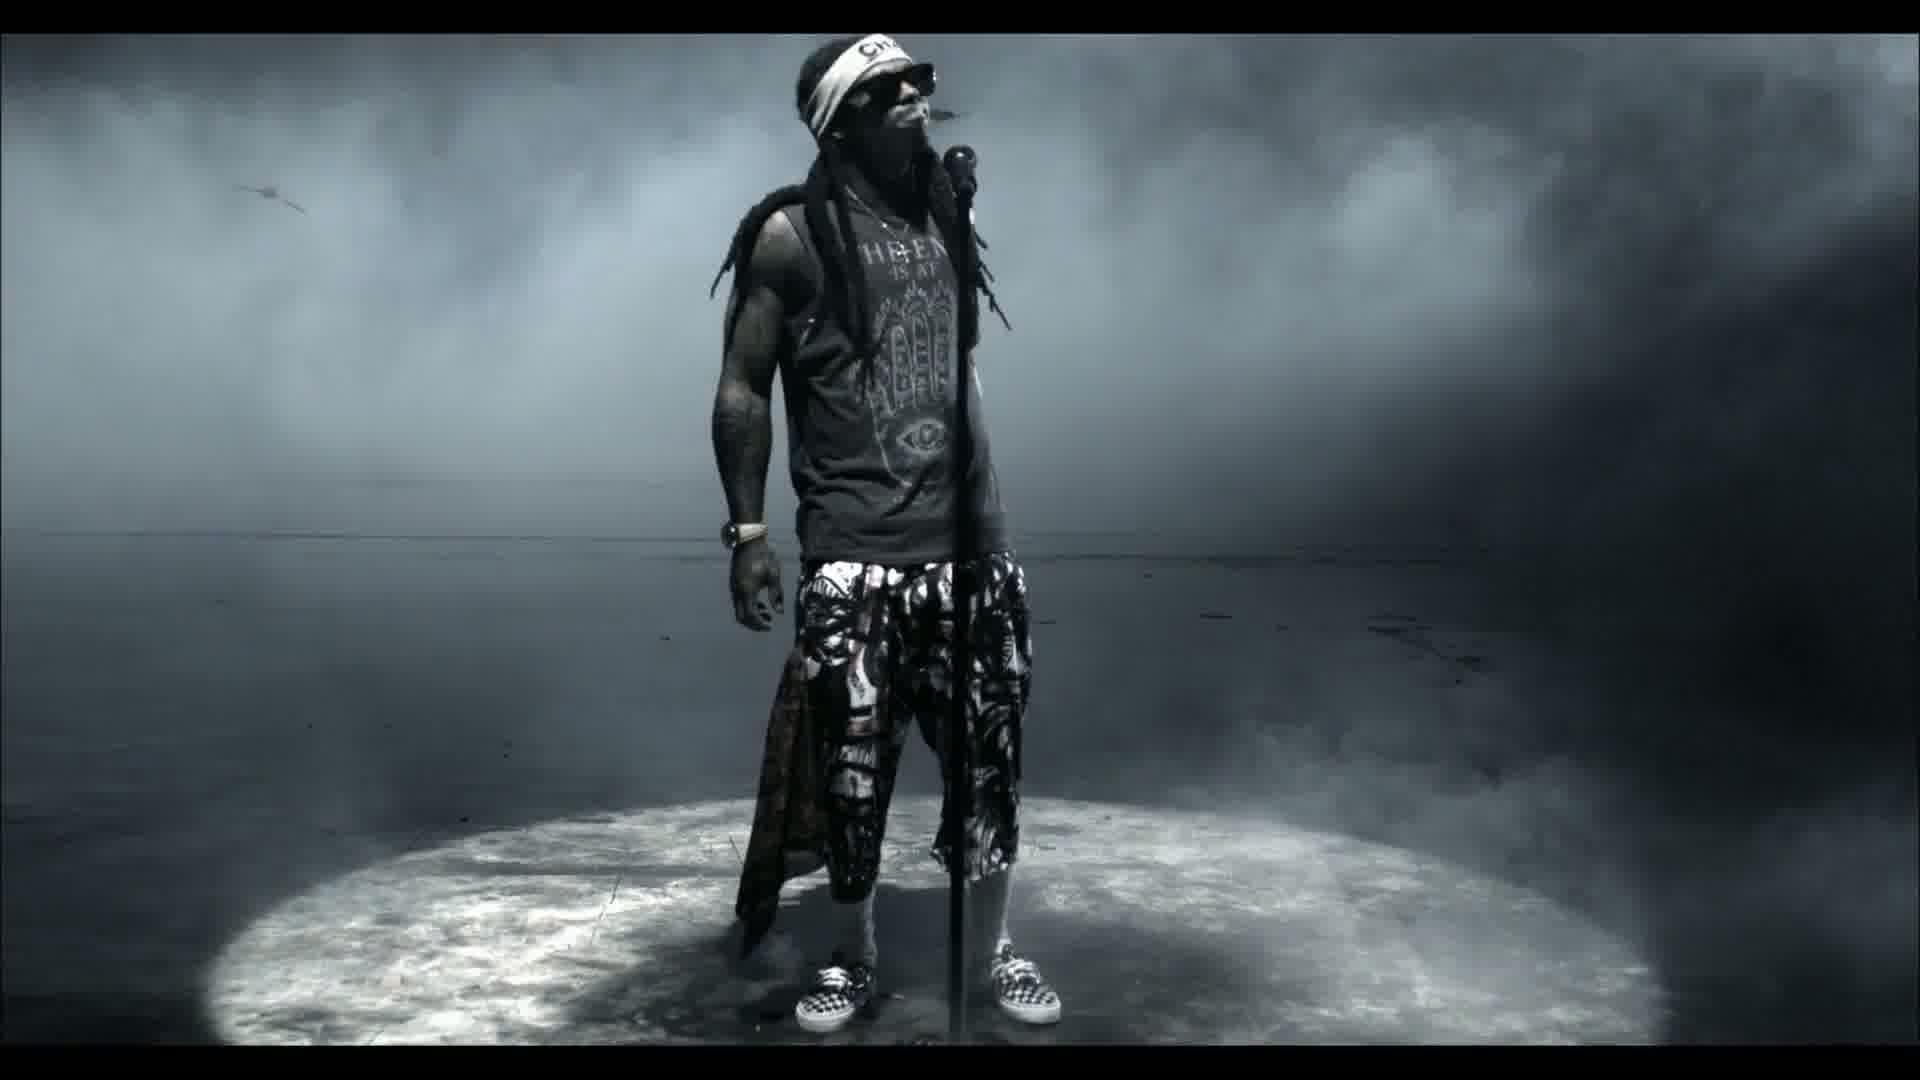 Lil Wayne Pics 2016 Wallpapers